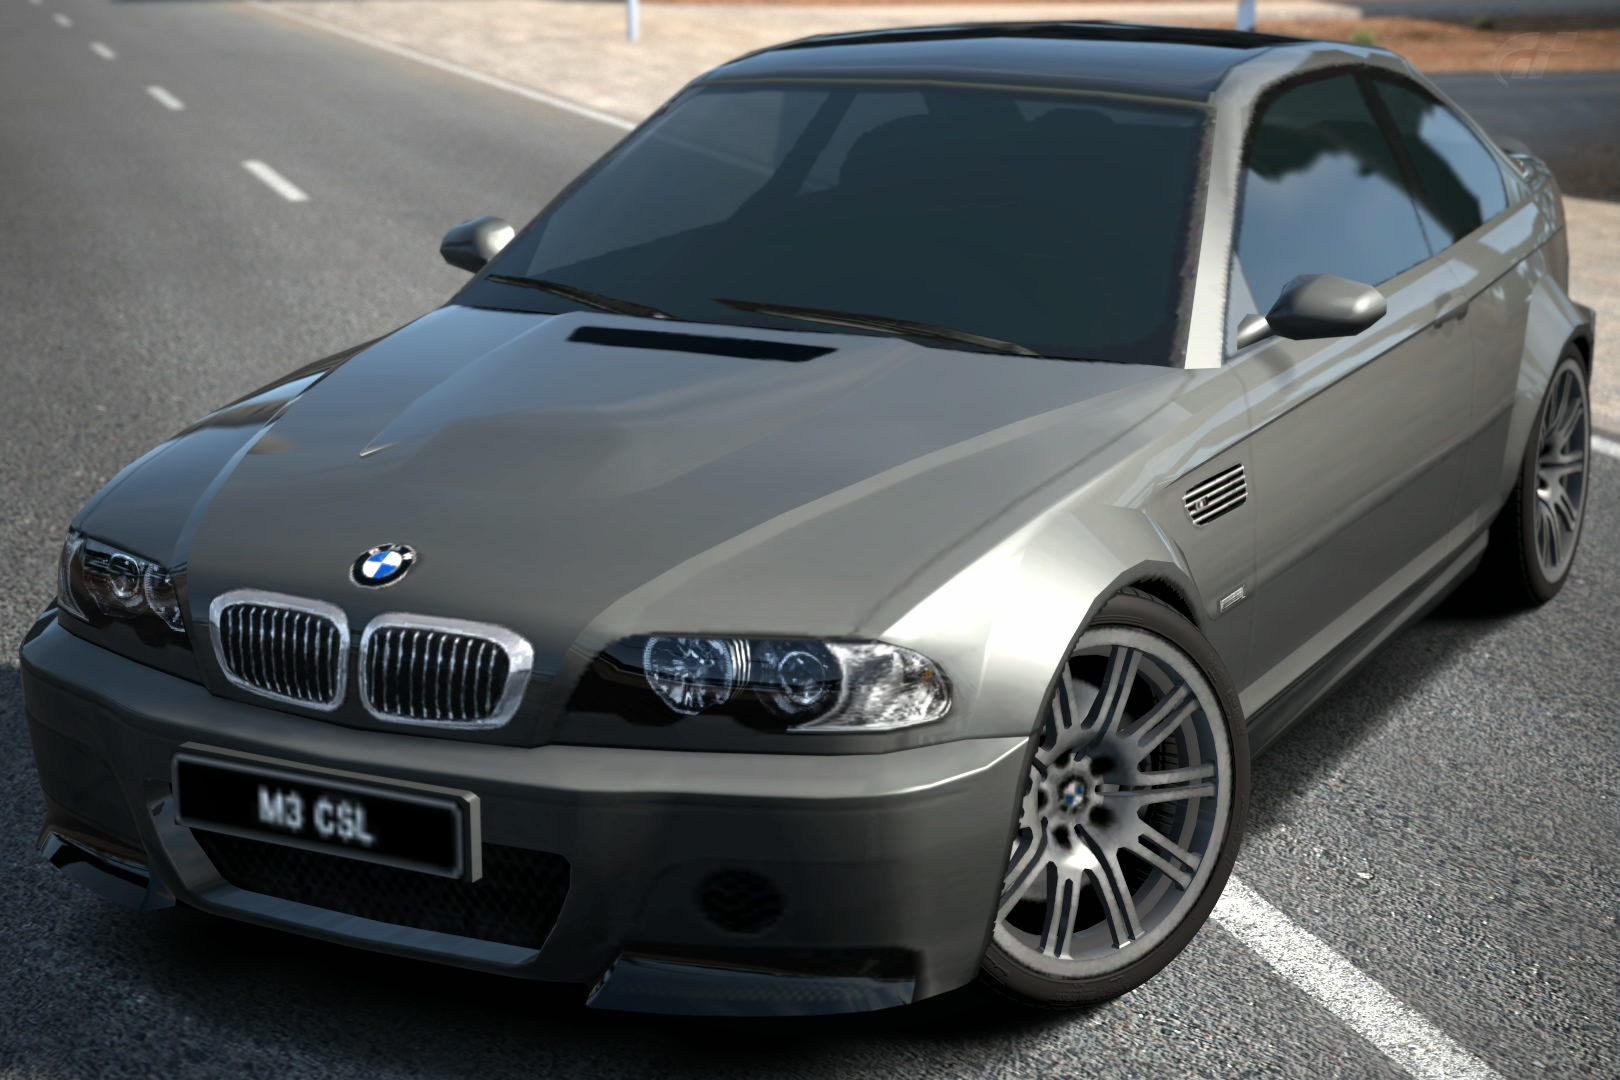 Bmw M3 Csl 03 Gran Turismo Wiki Fandom